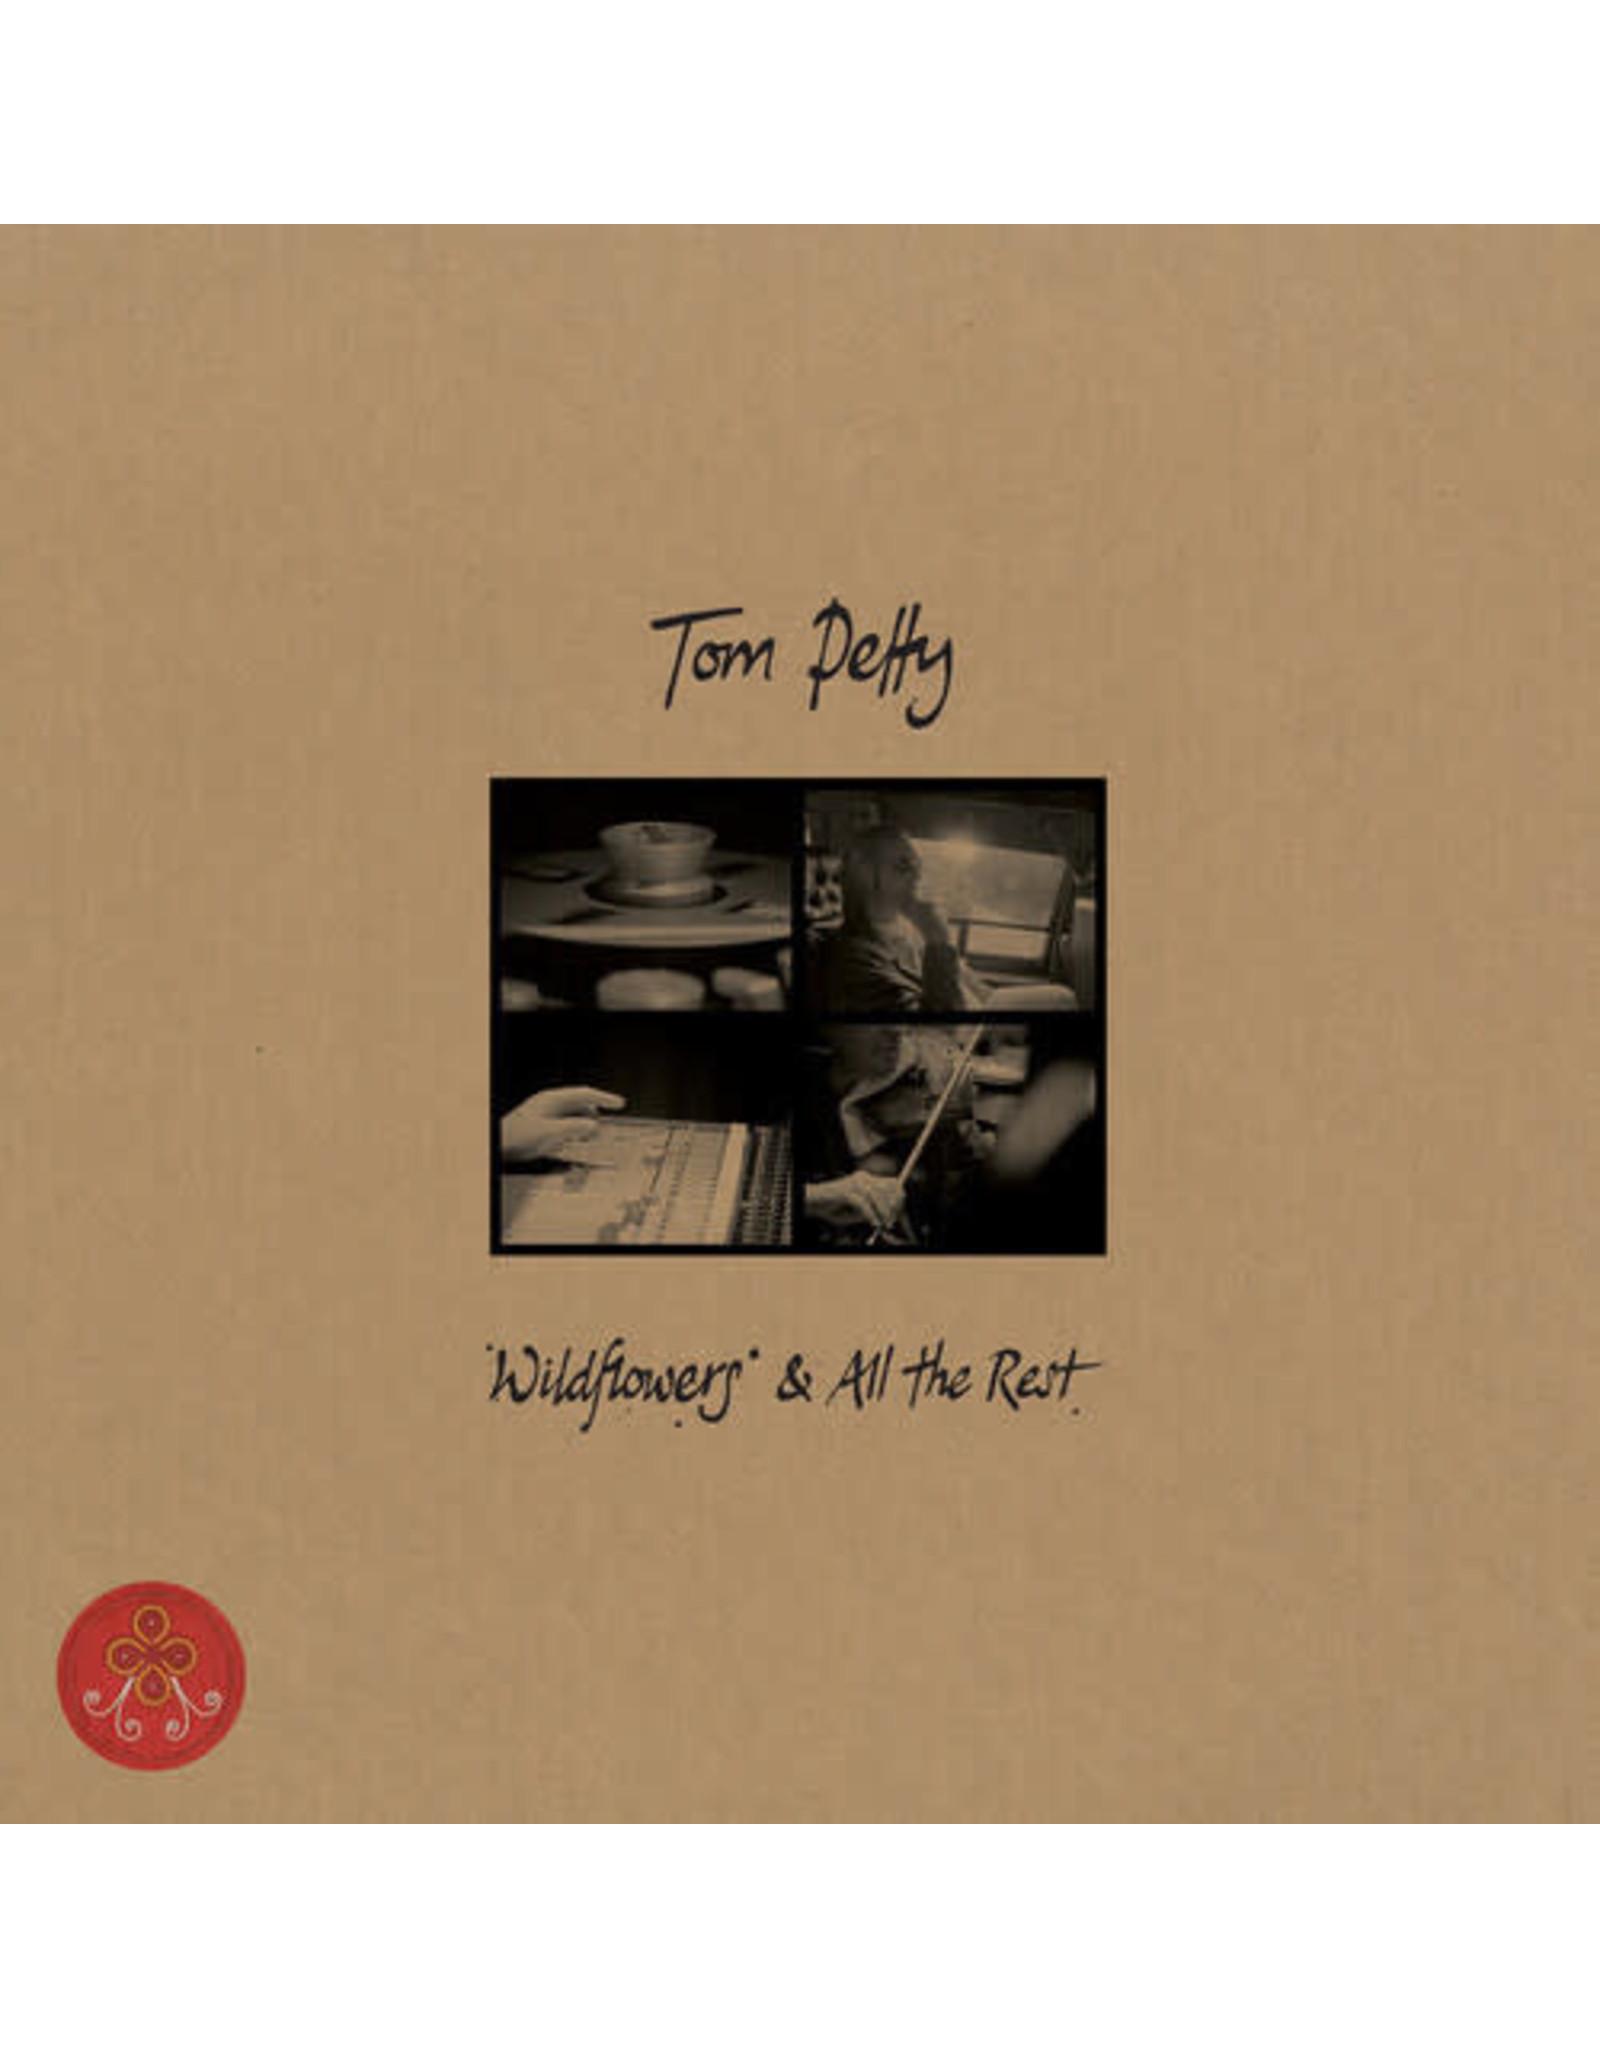 New Vinyl Tom Petty - Wildflowers & All The Rest 3LP